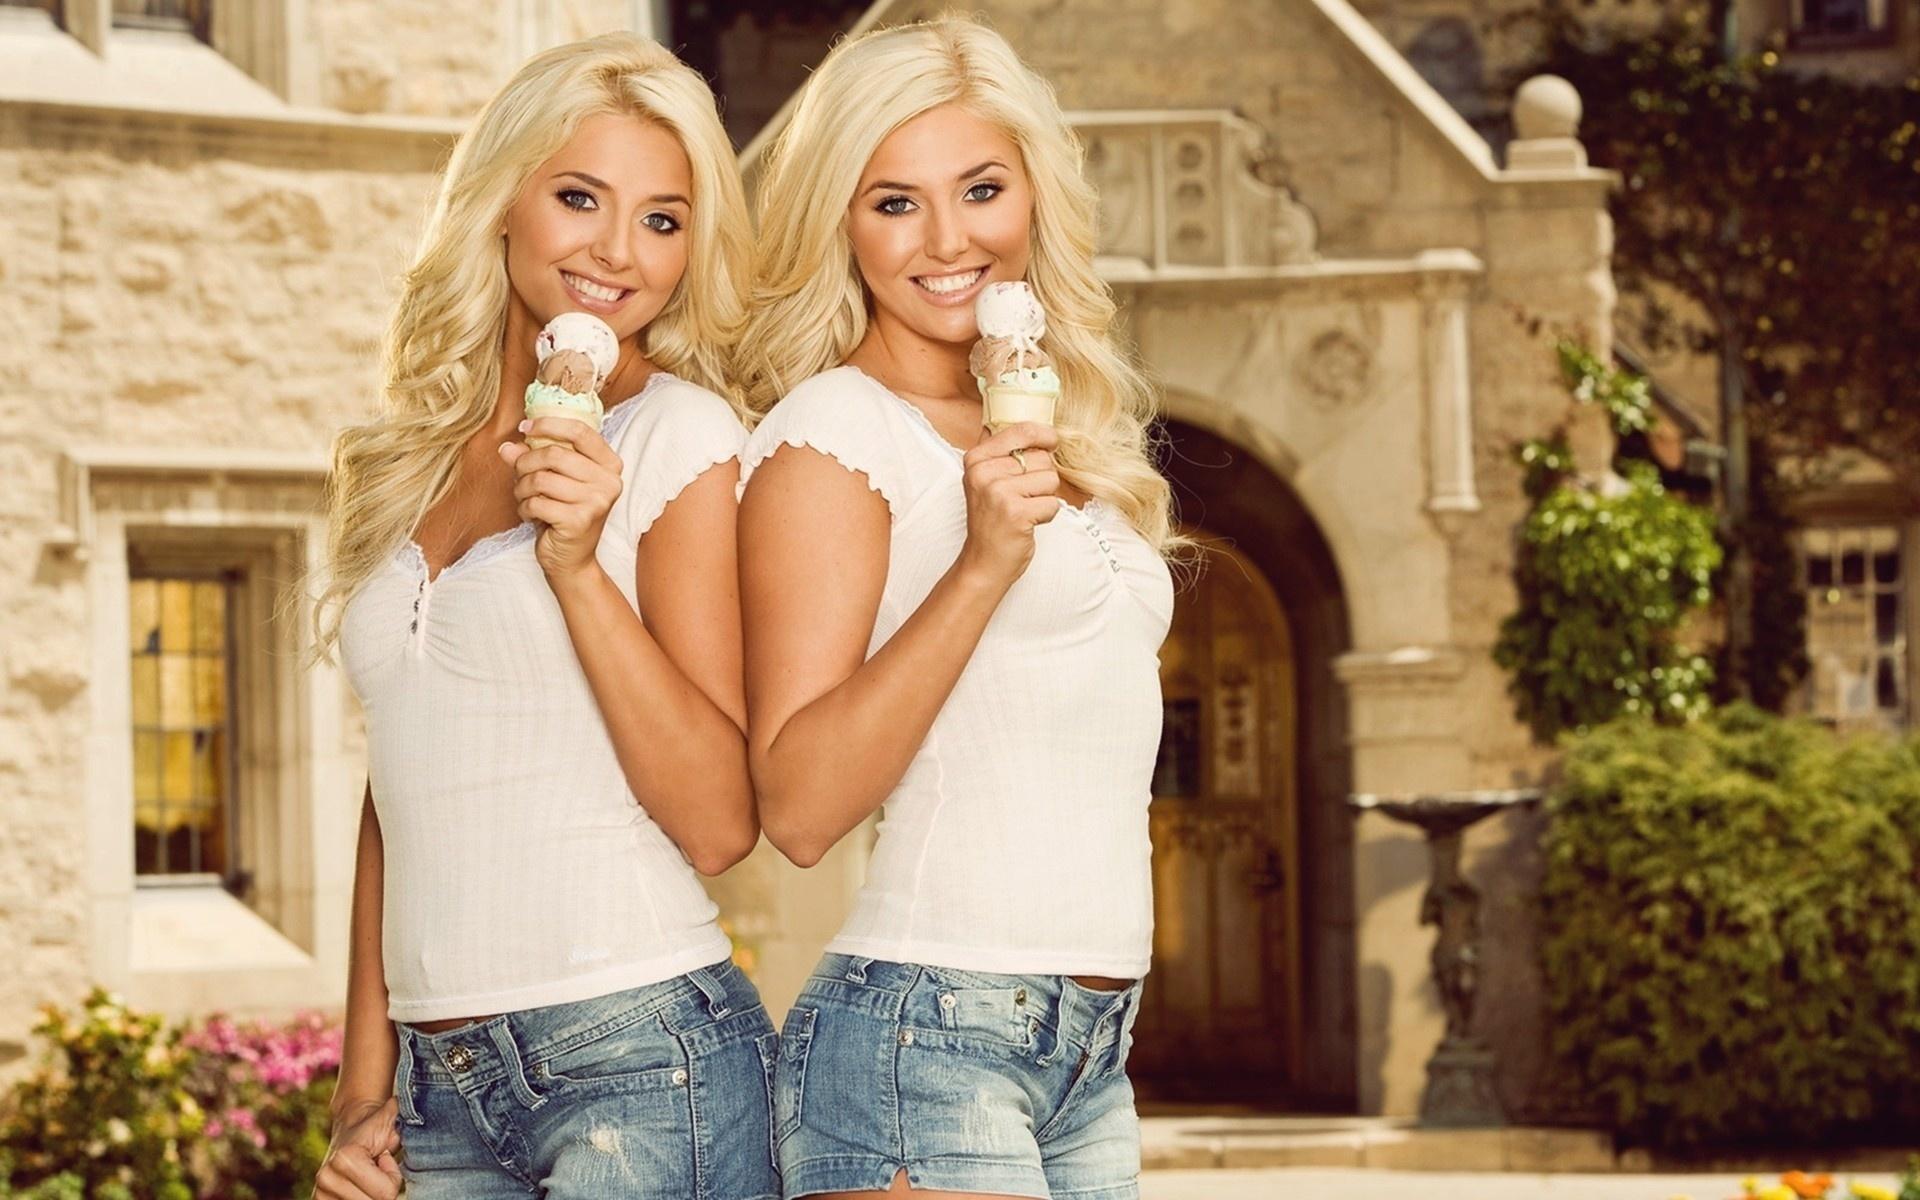 blondinki-i-muzhik-odin